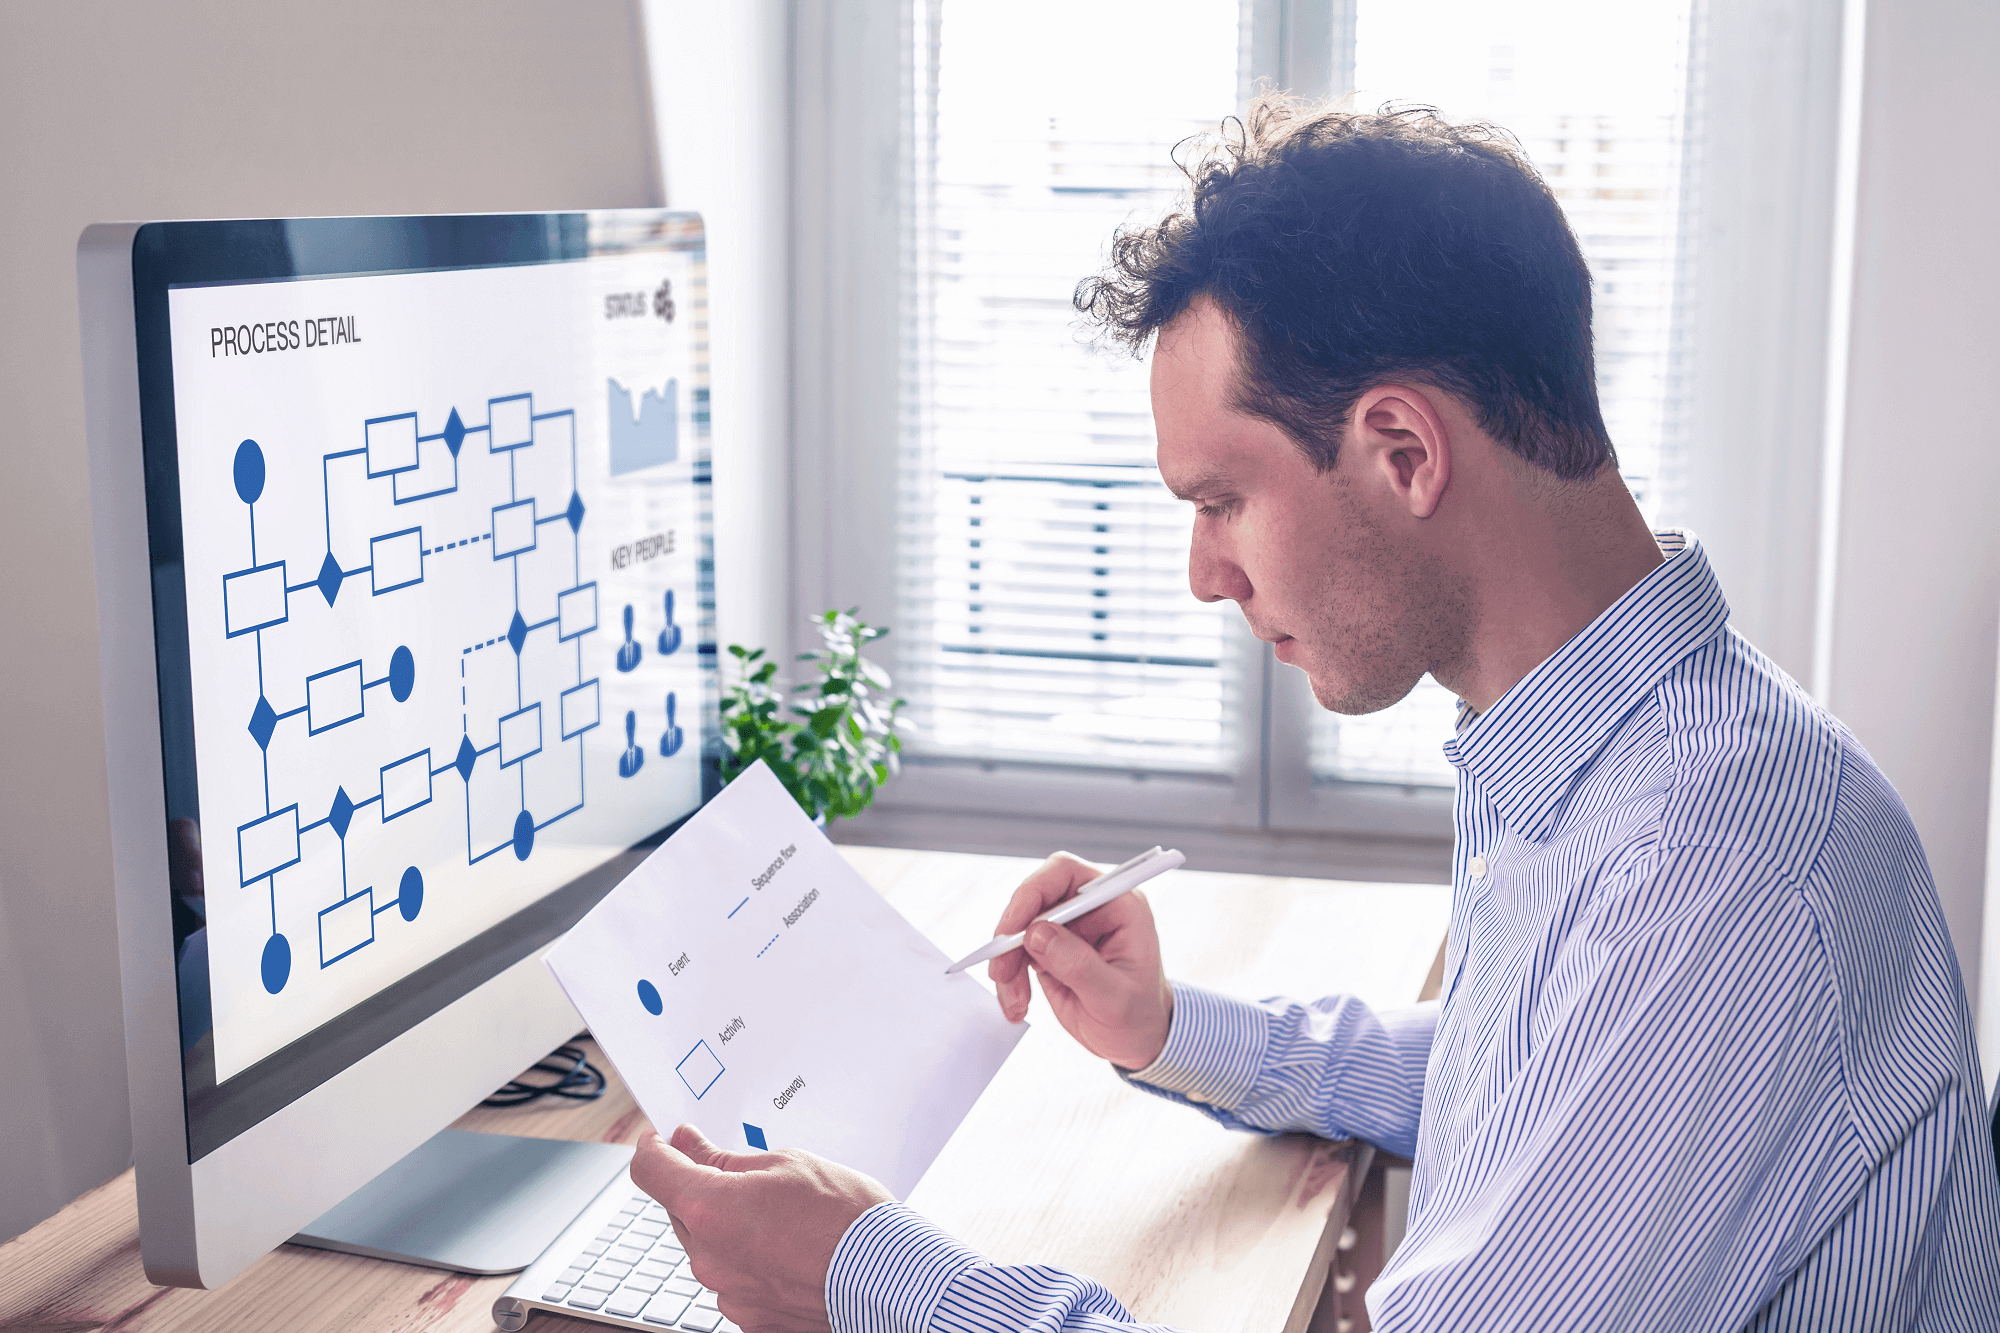 Procesmodel as a Service™ | Binnen enkele werkdagen resultaat